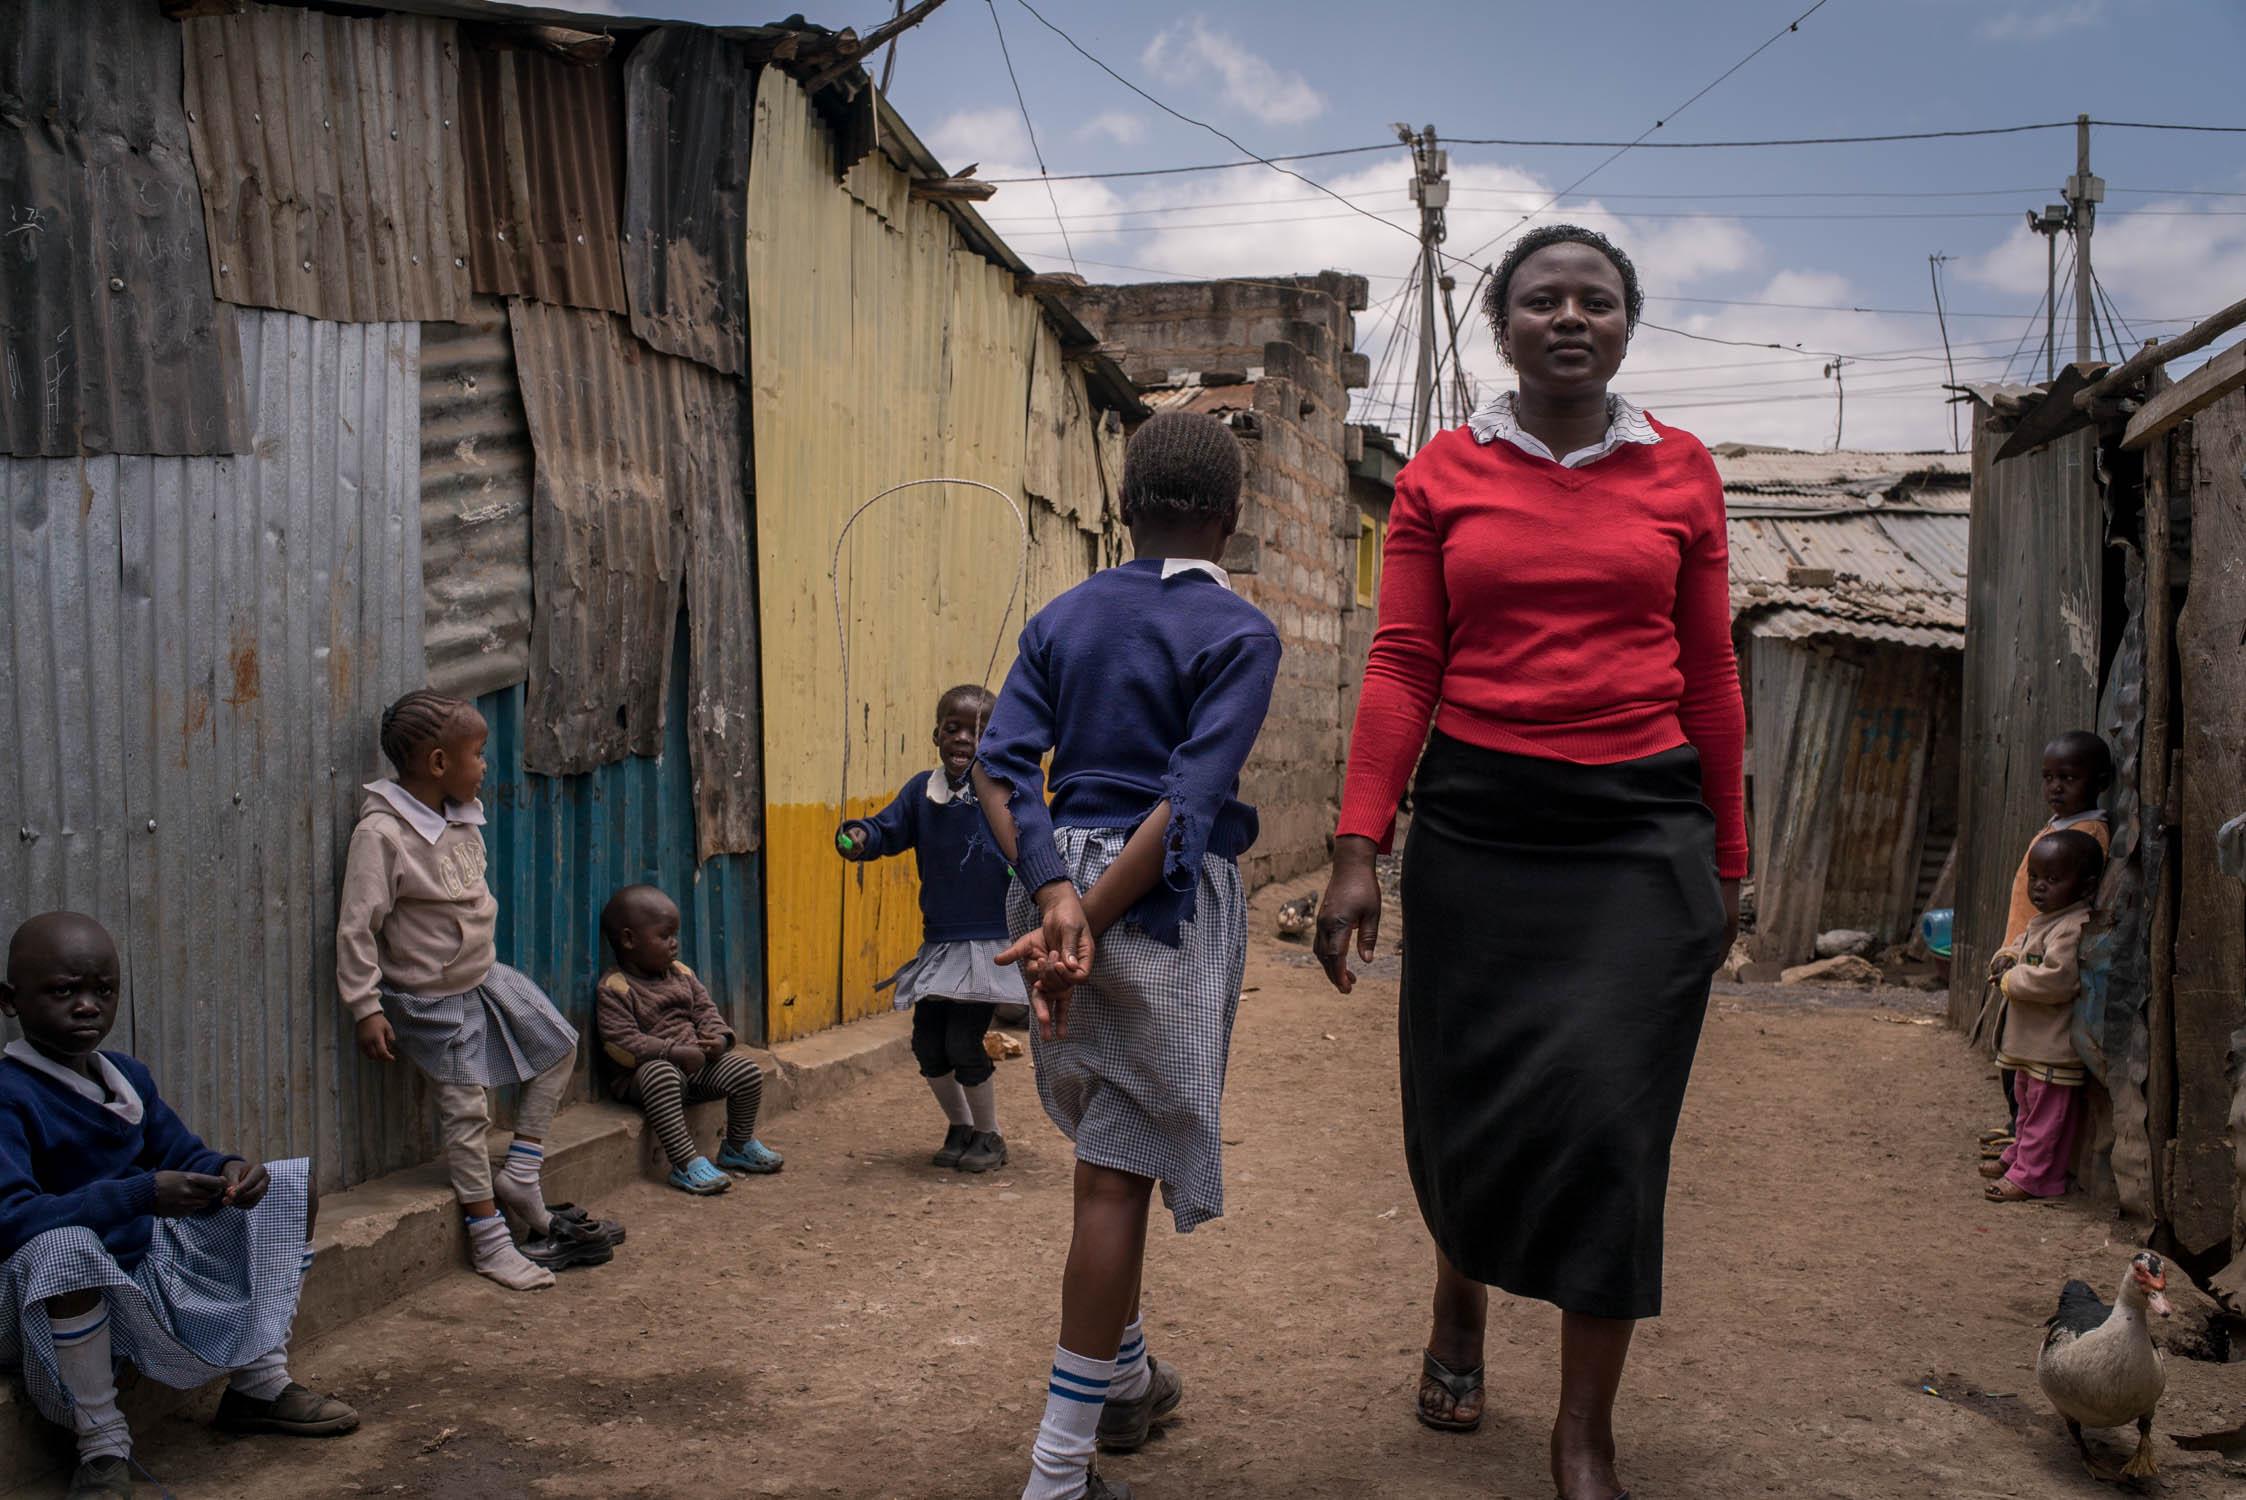 A teacher walks past children at a school (not Bridge) in Mathare slum area of Nairobi. September 19, 2016. Mathare slum, Nairobi, Kenya.